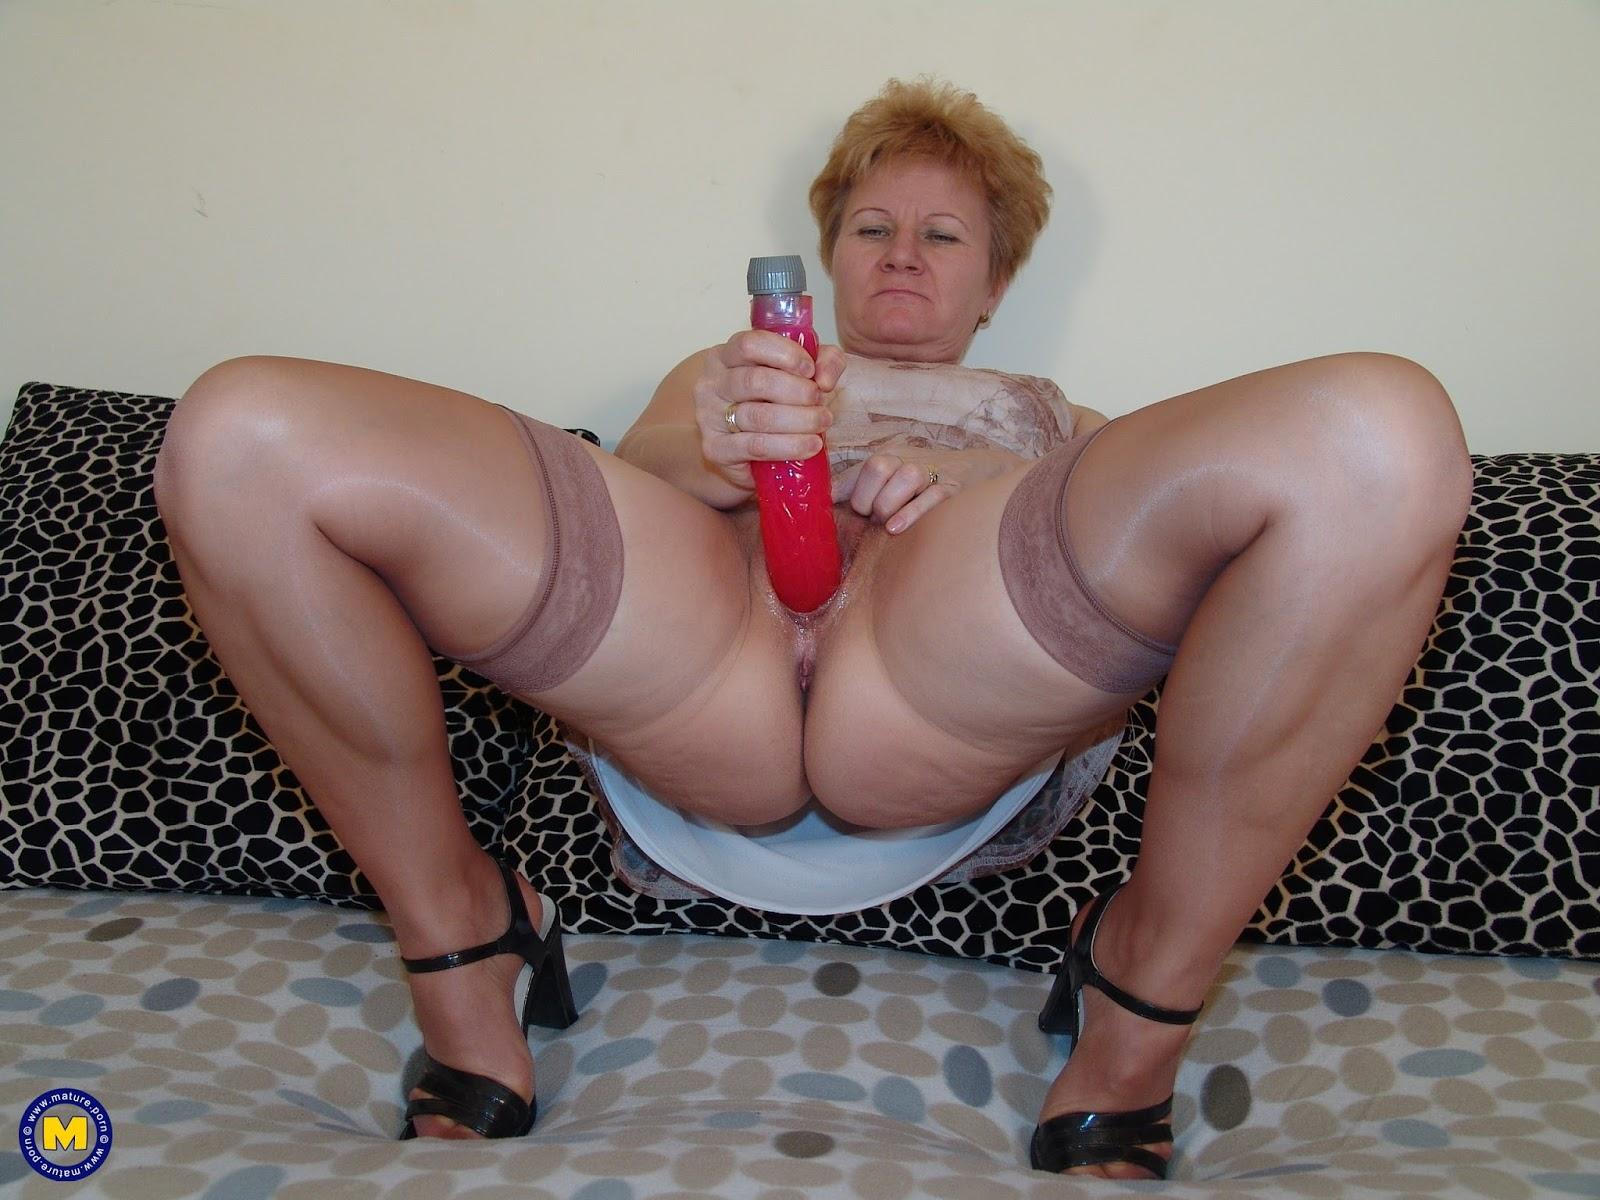 Archive Of Old Women Rozalia Mature Active Masturbation-5079